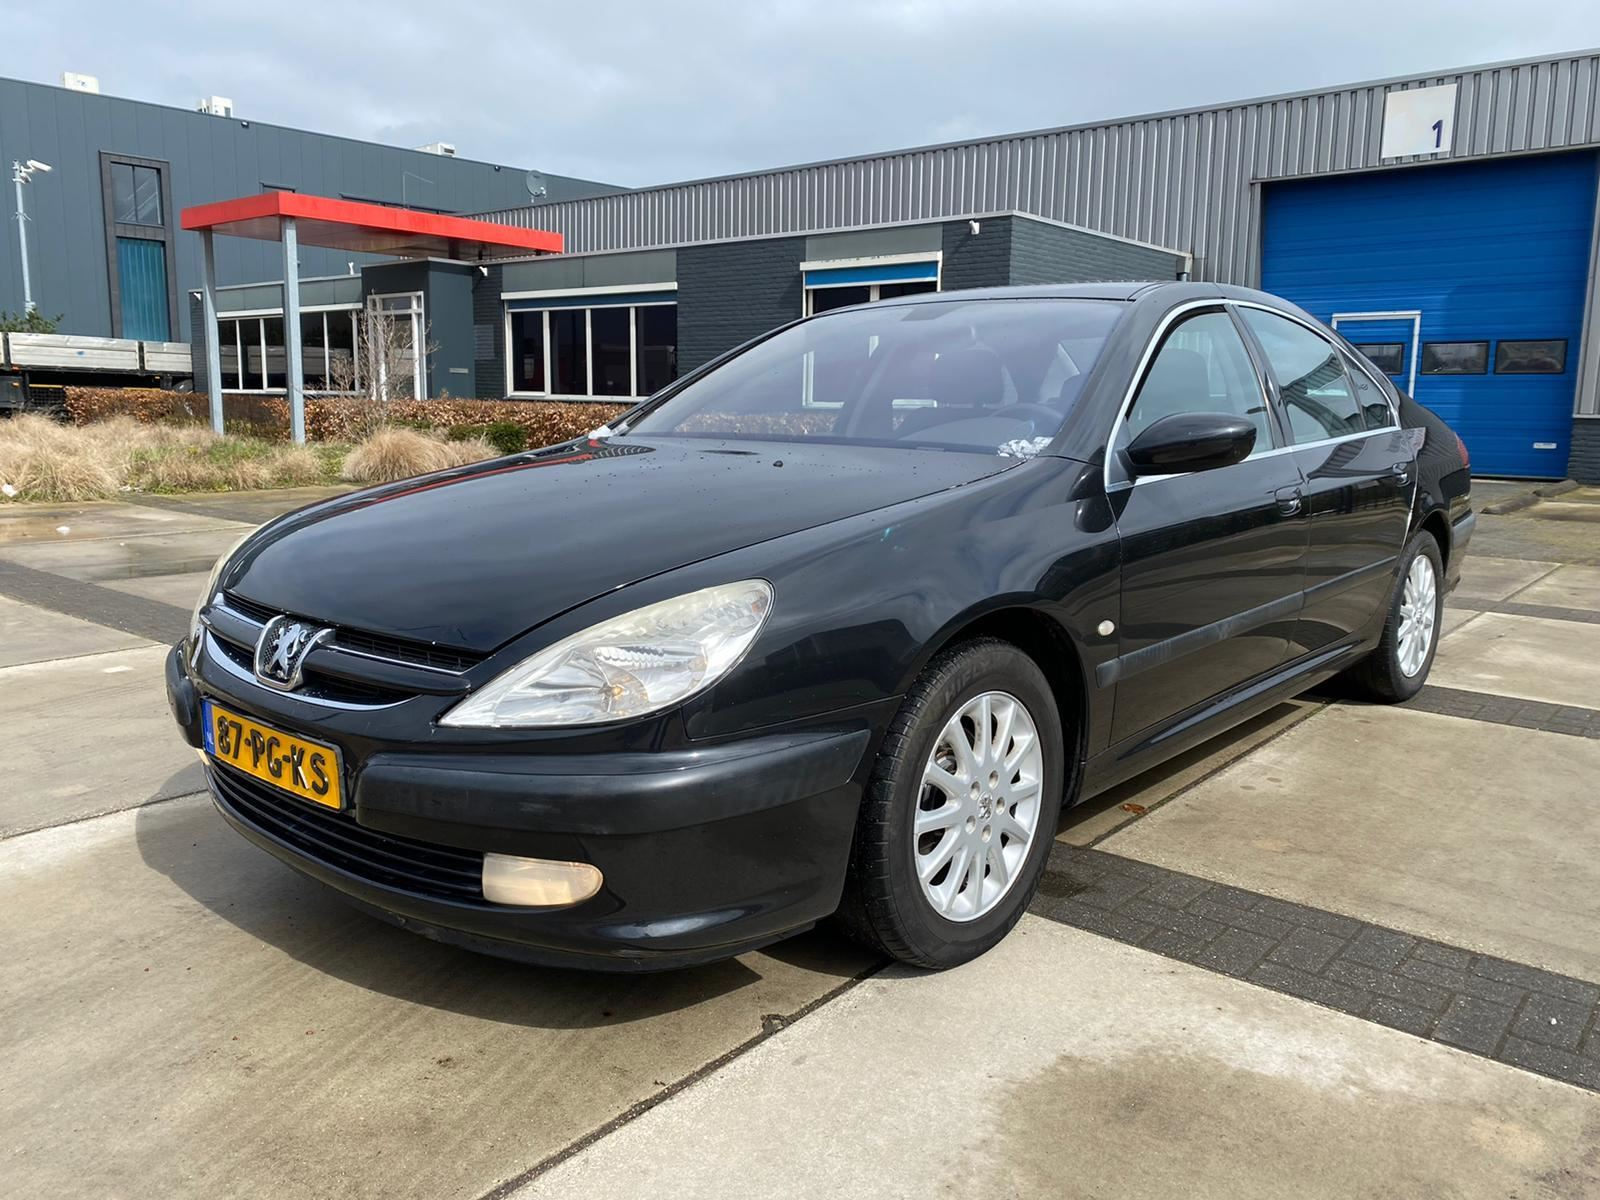 Peugeot 607 occasion - A2 Auto's